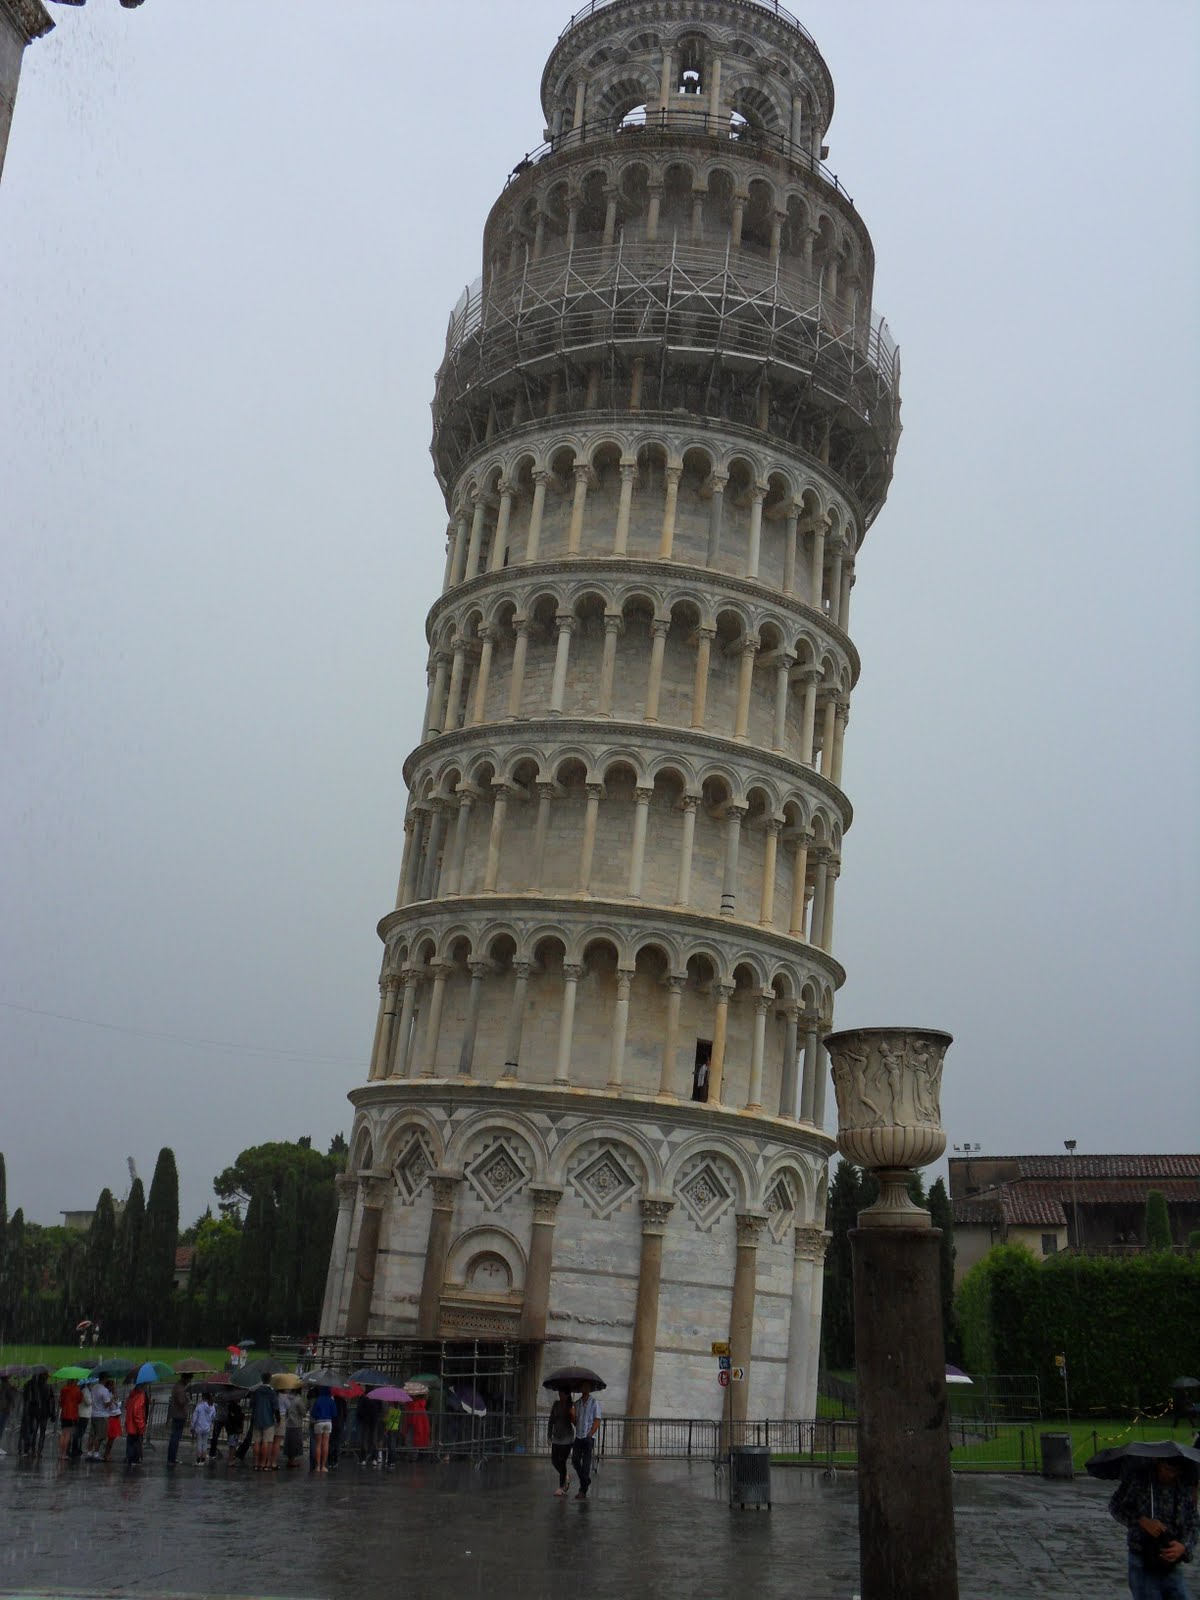 Famous landmarks monuments bing images for Famous landmarks in